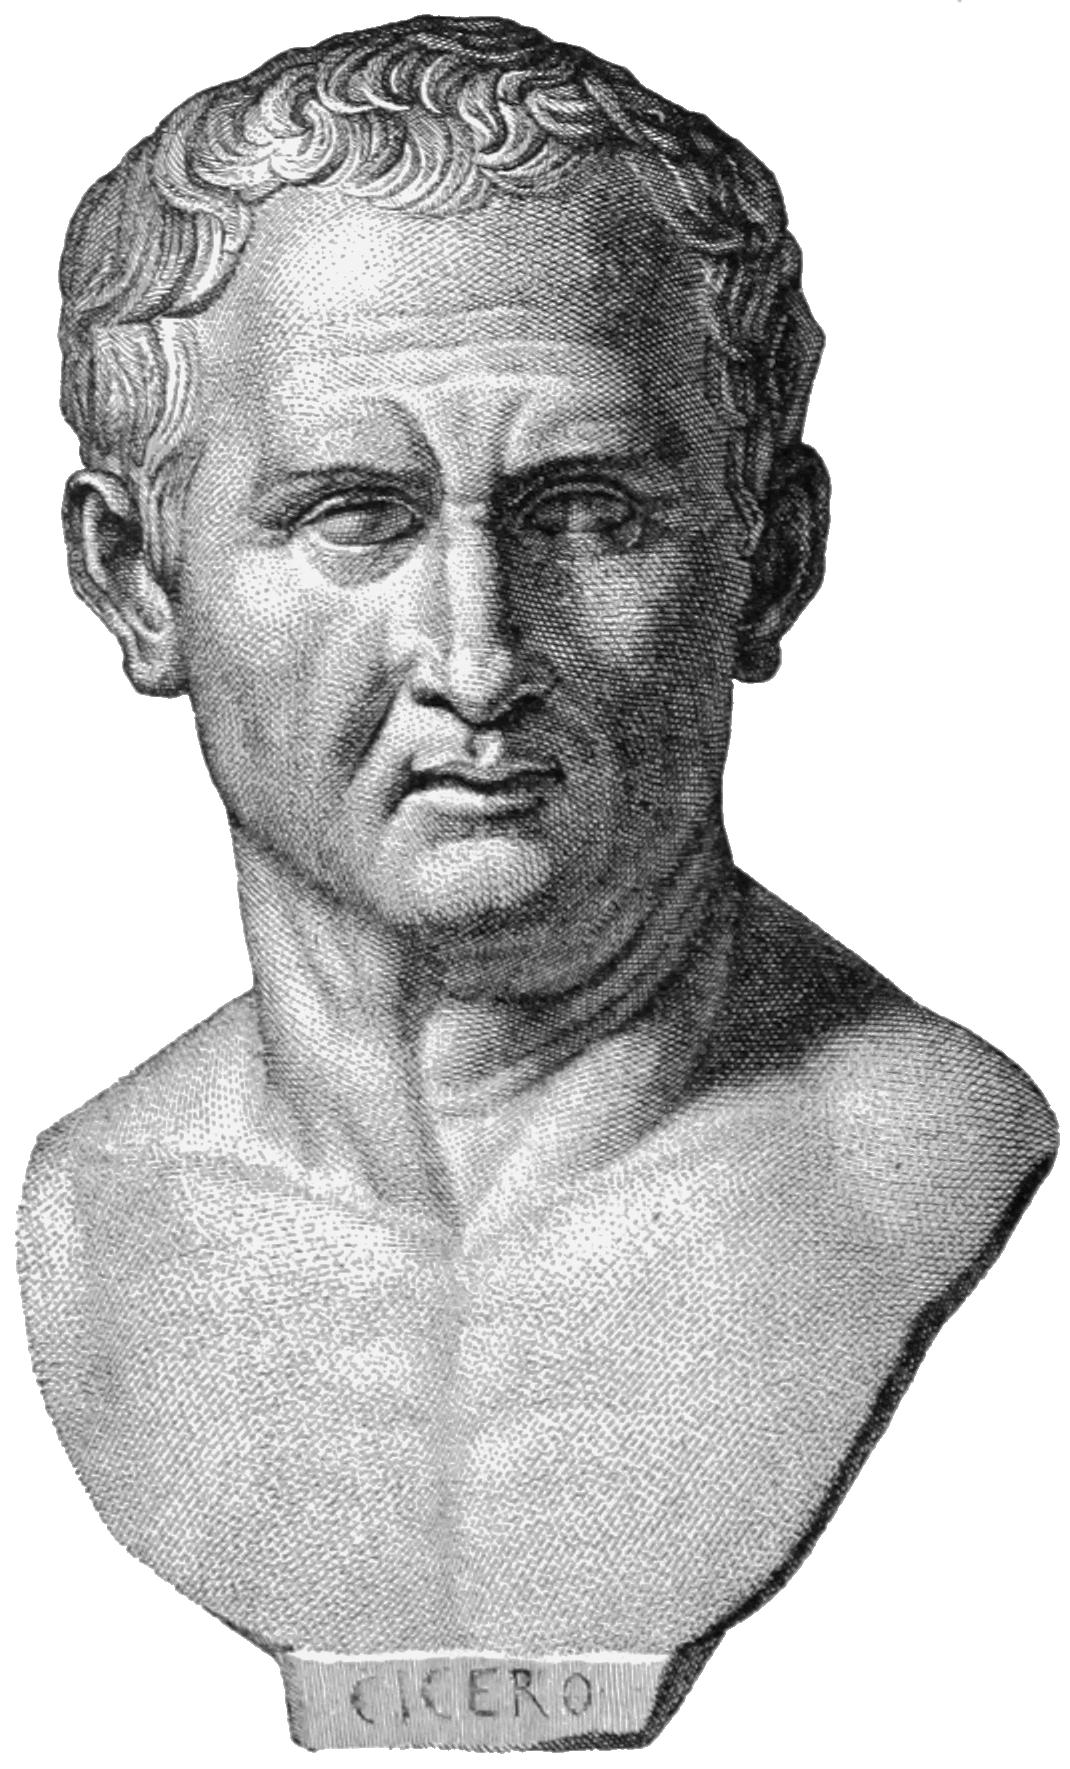 Cicero.